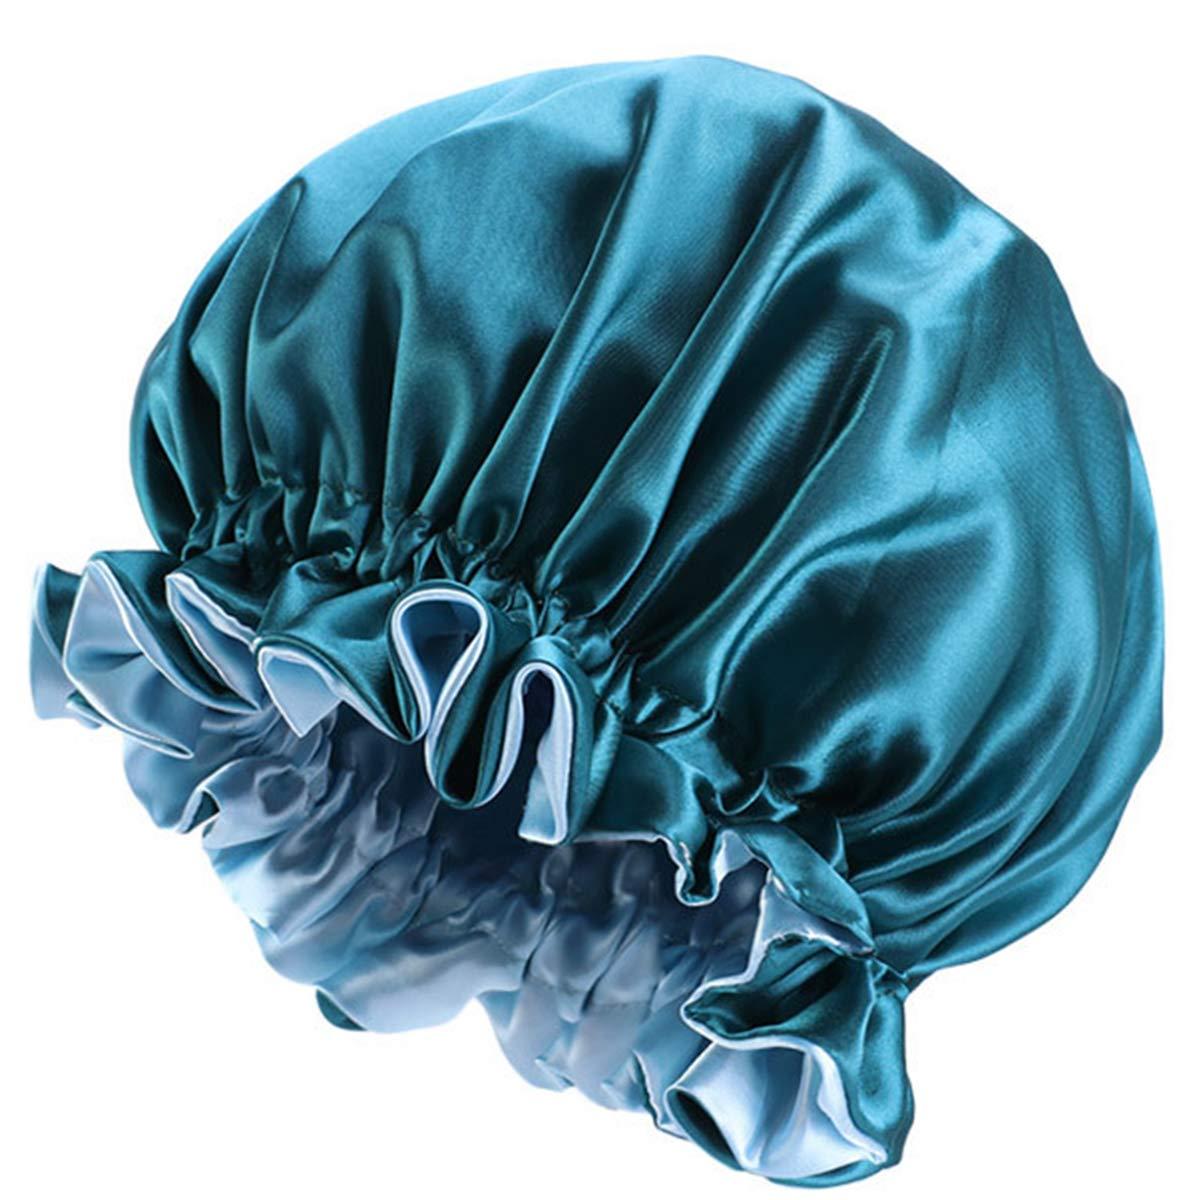 oenbopo Satin Bonnet Shower Cap Women Satin Bonnet Dual-layer Reversible Sleeping Hat Head Cover Bathing Hat